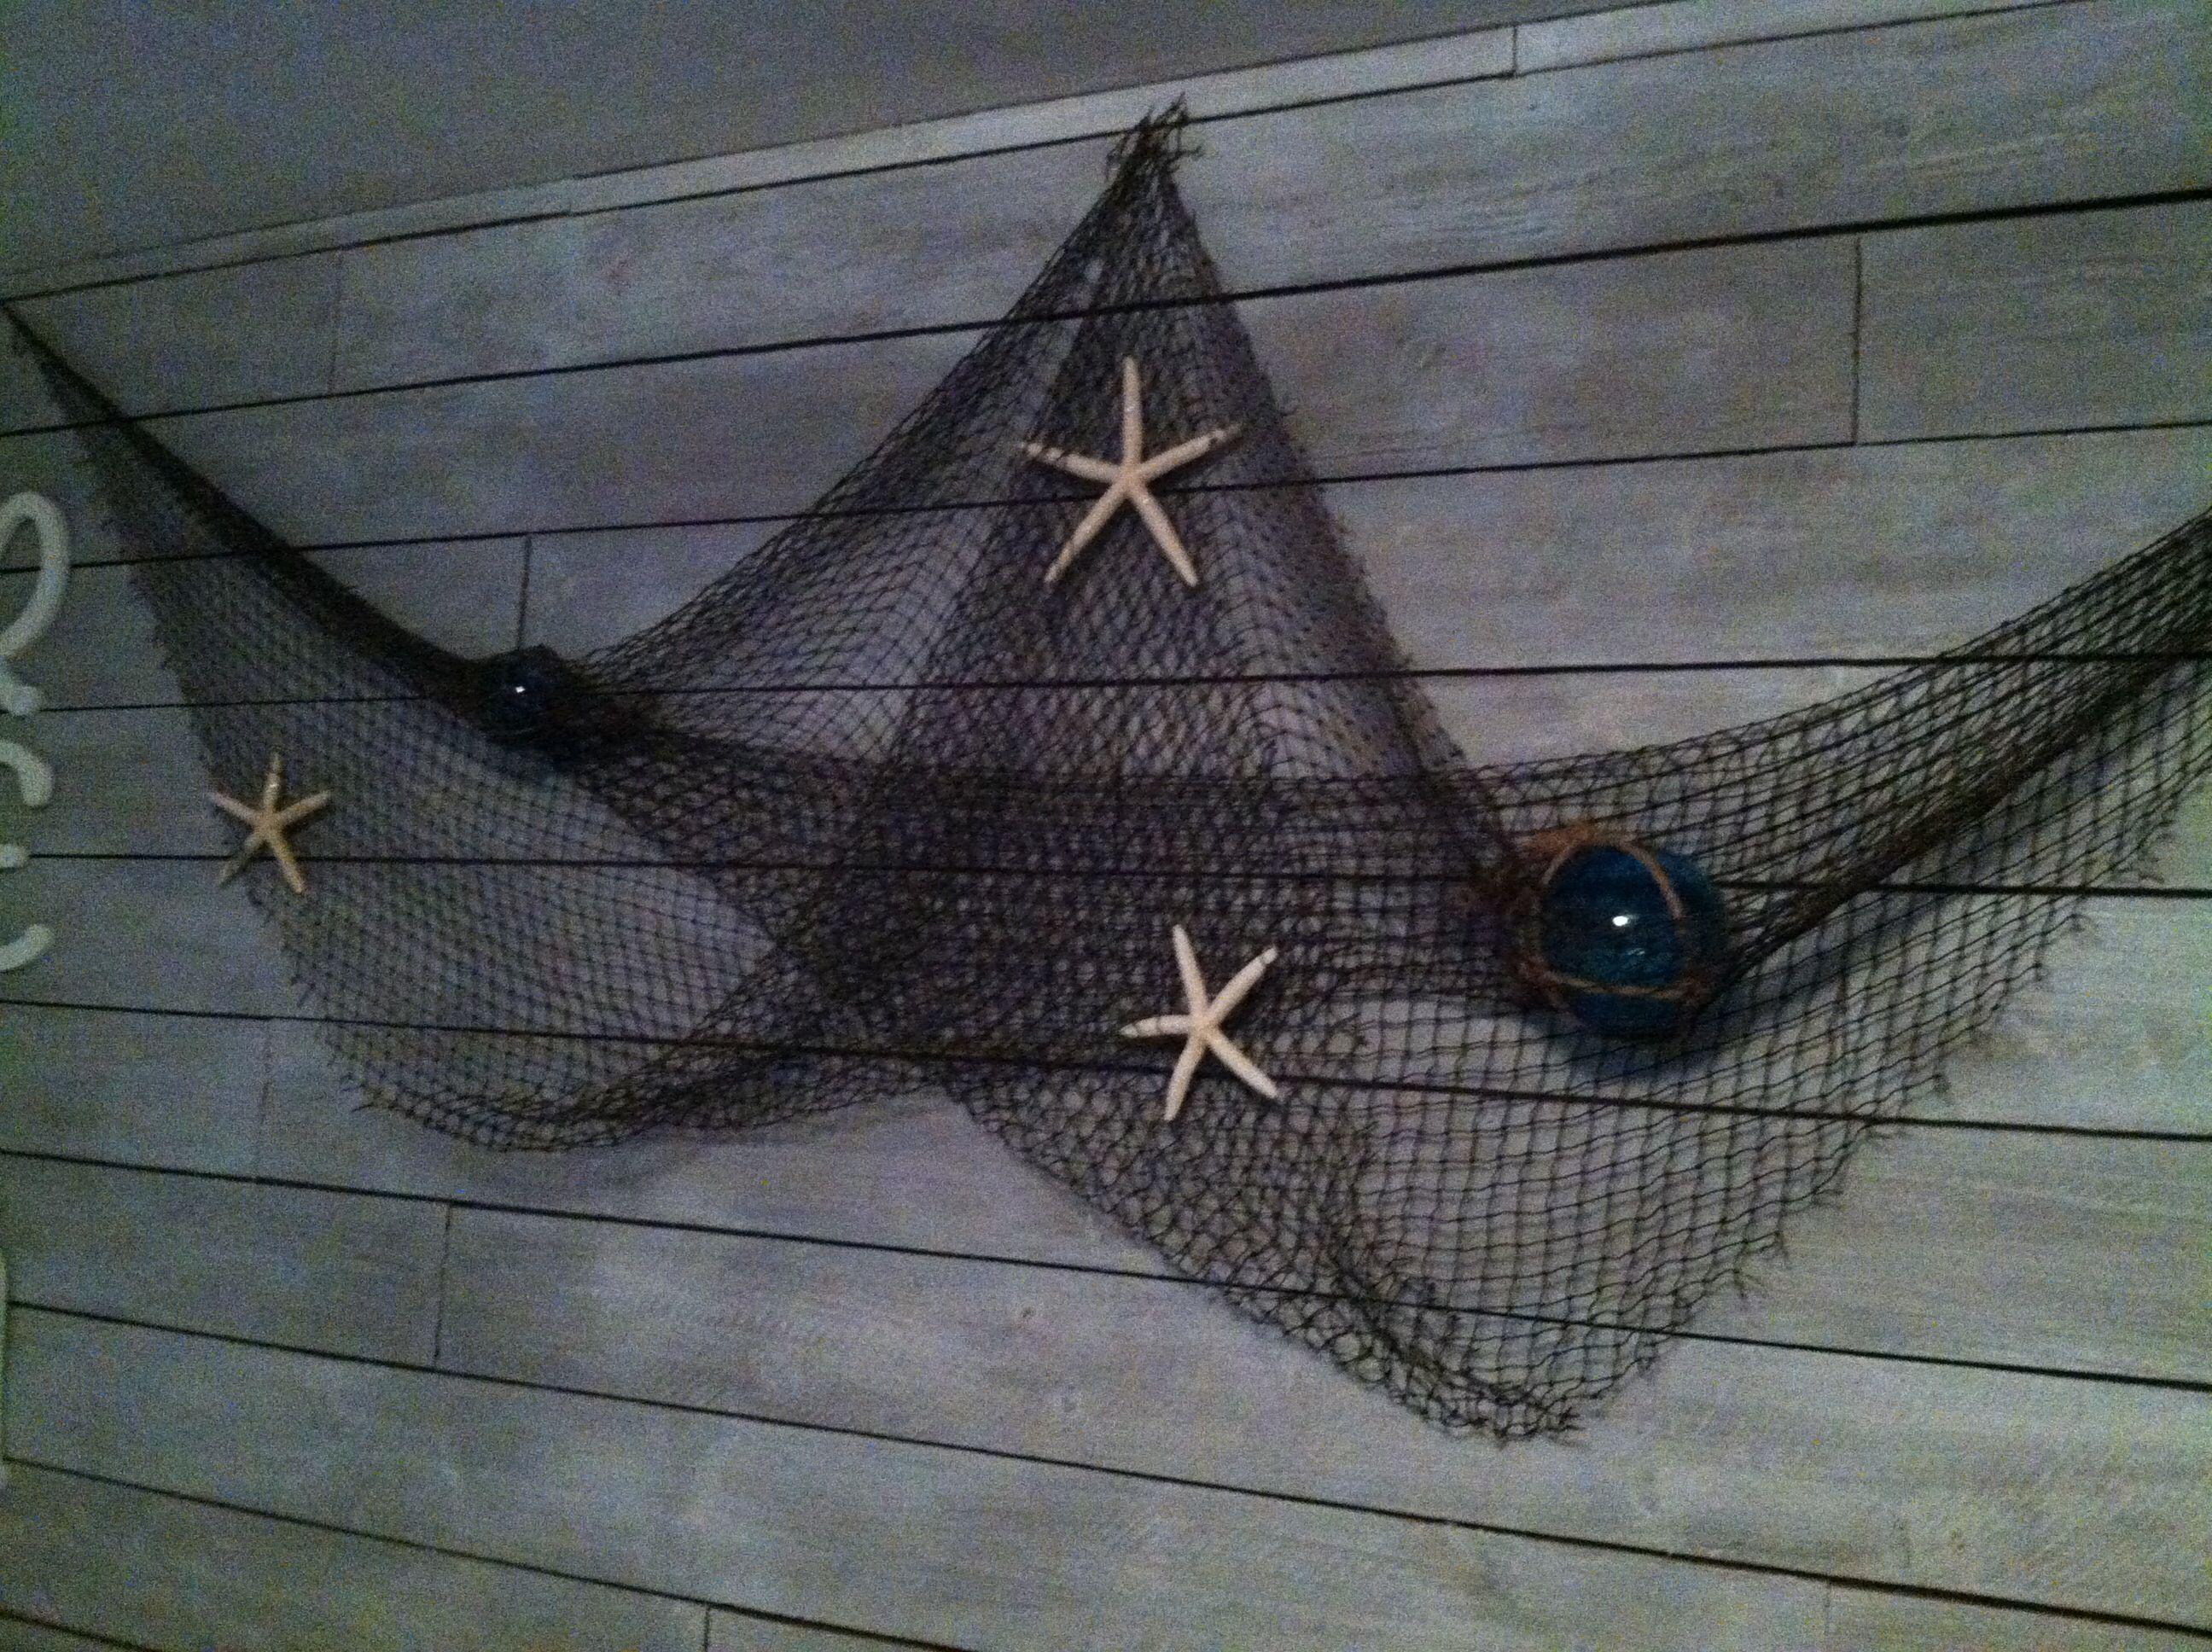 Fish net wall decor my home remodel pinterest wall decor fish net wall decor amipublicfo Gallery